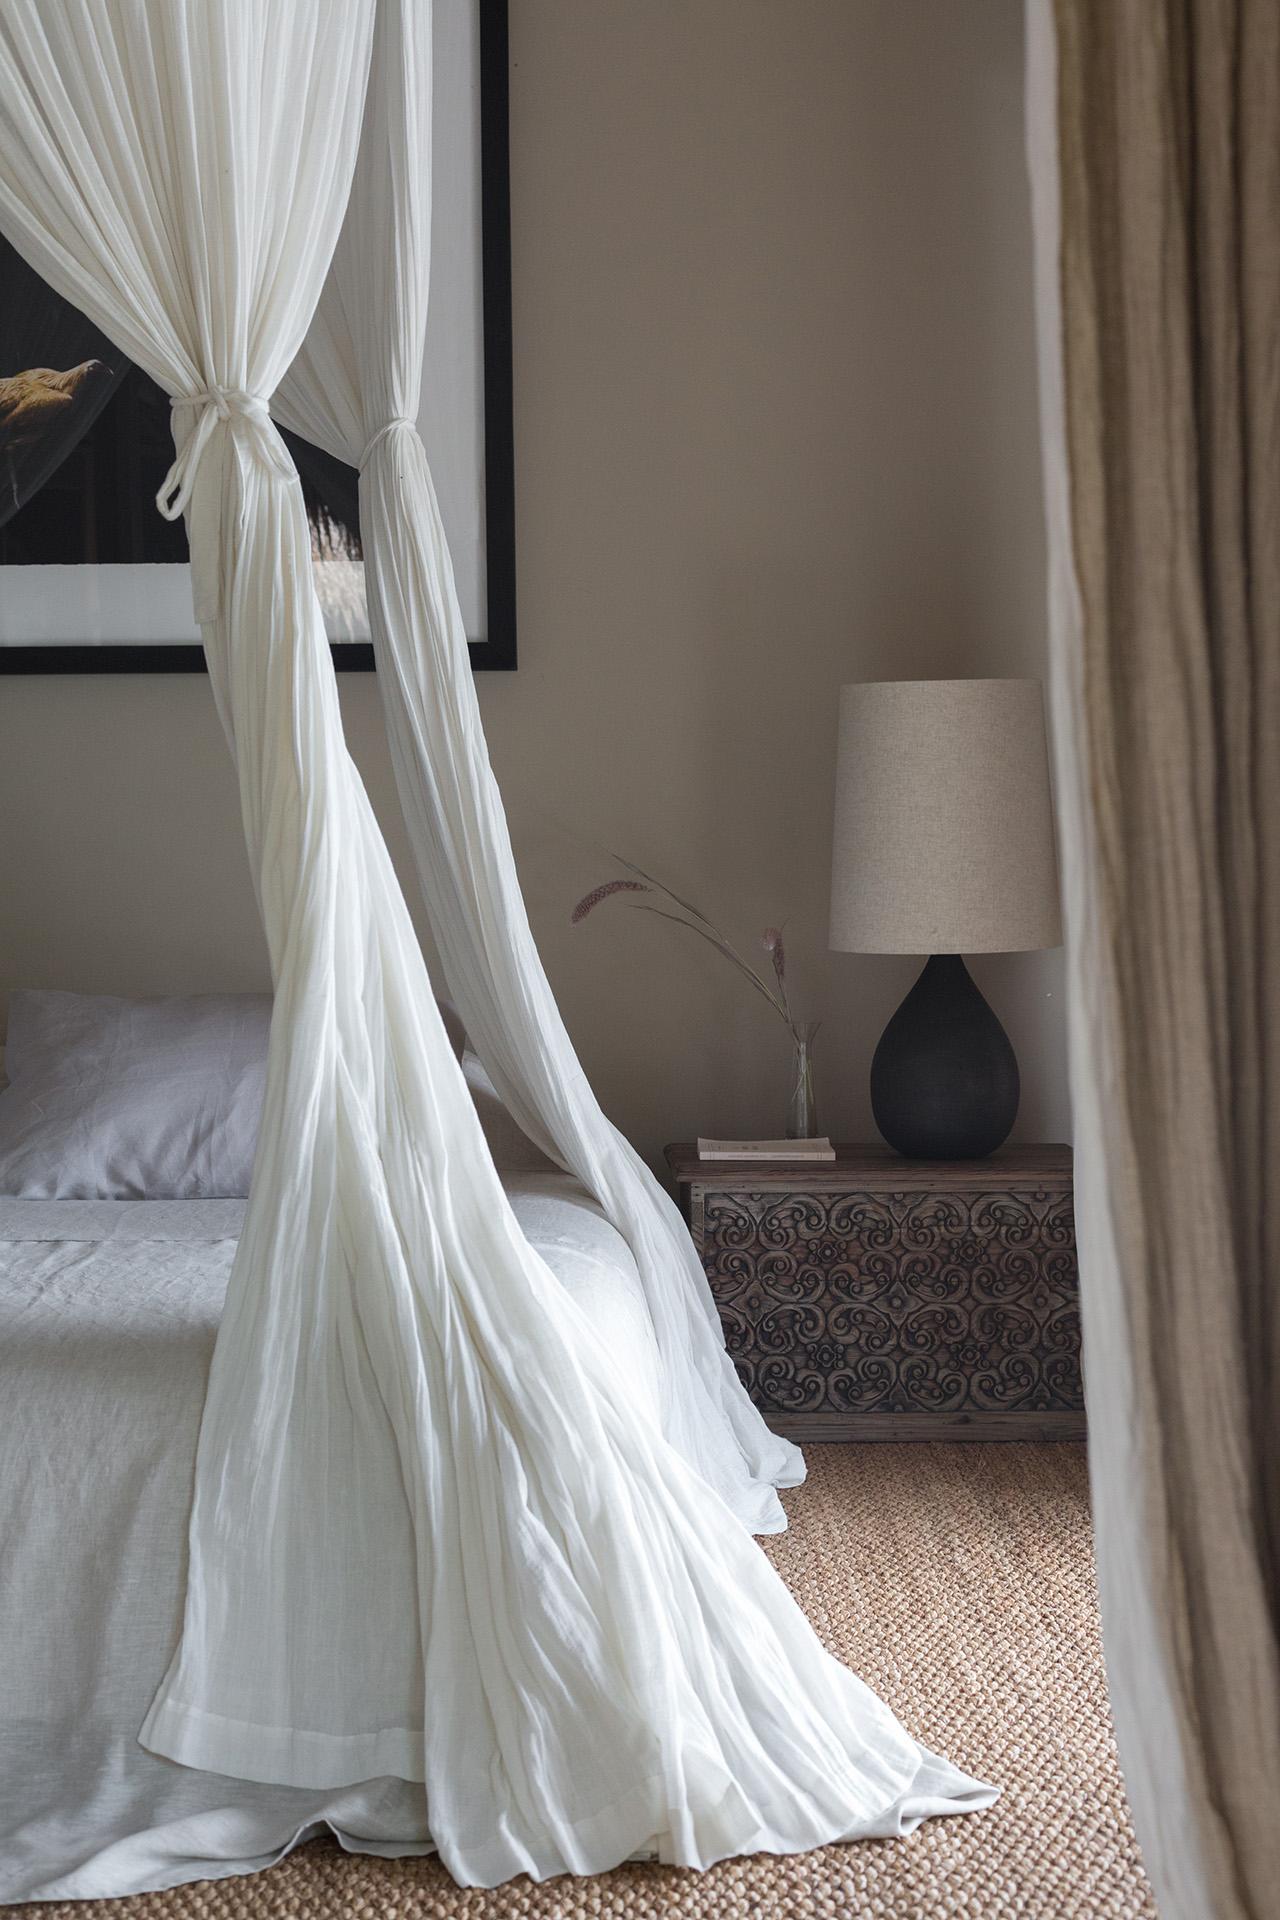 The Meier bedroom. Photo by Jencquel Tommaso Rica. Styling byLisa Scapin.